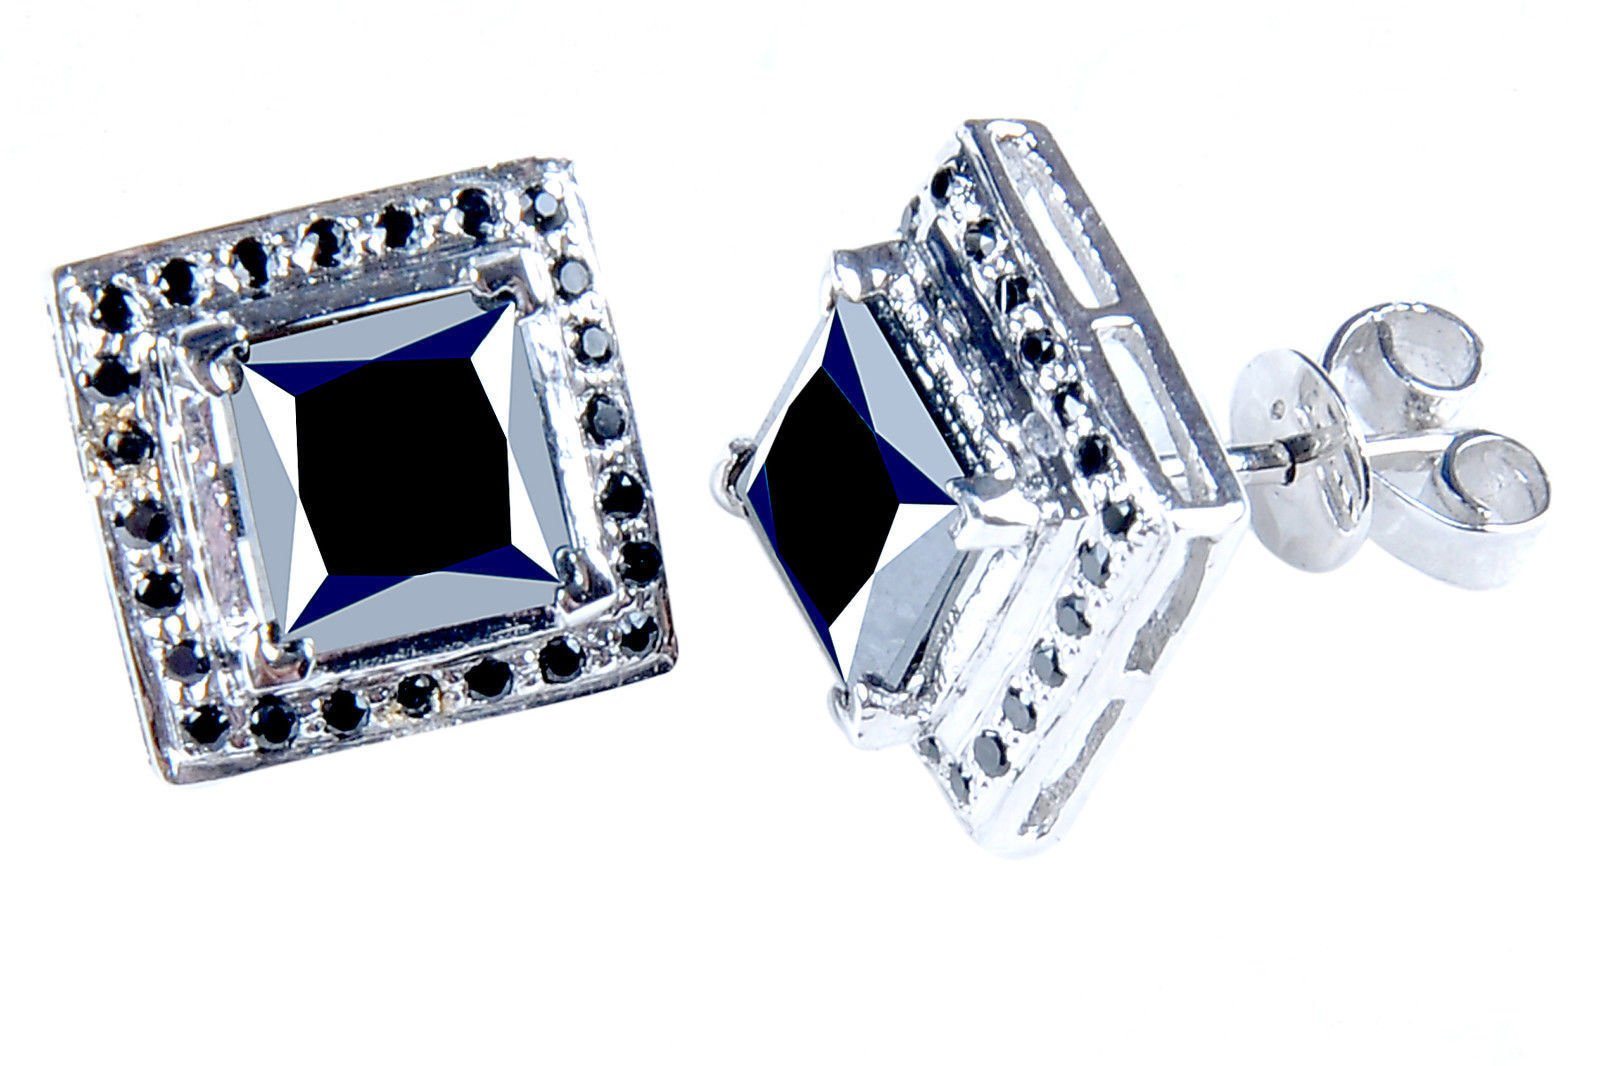 RINGJEWEL 5.55 ct Black Princess Real Moissanite Solitaire Stud Earrings